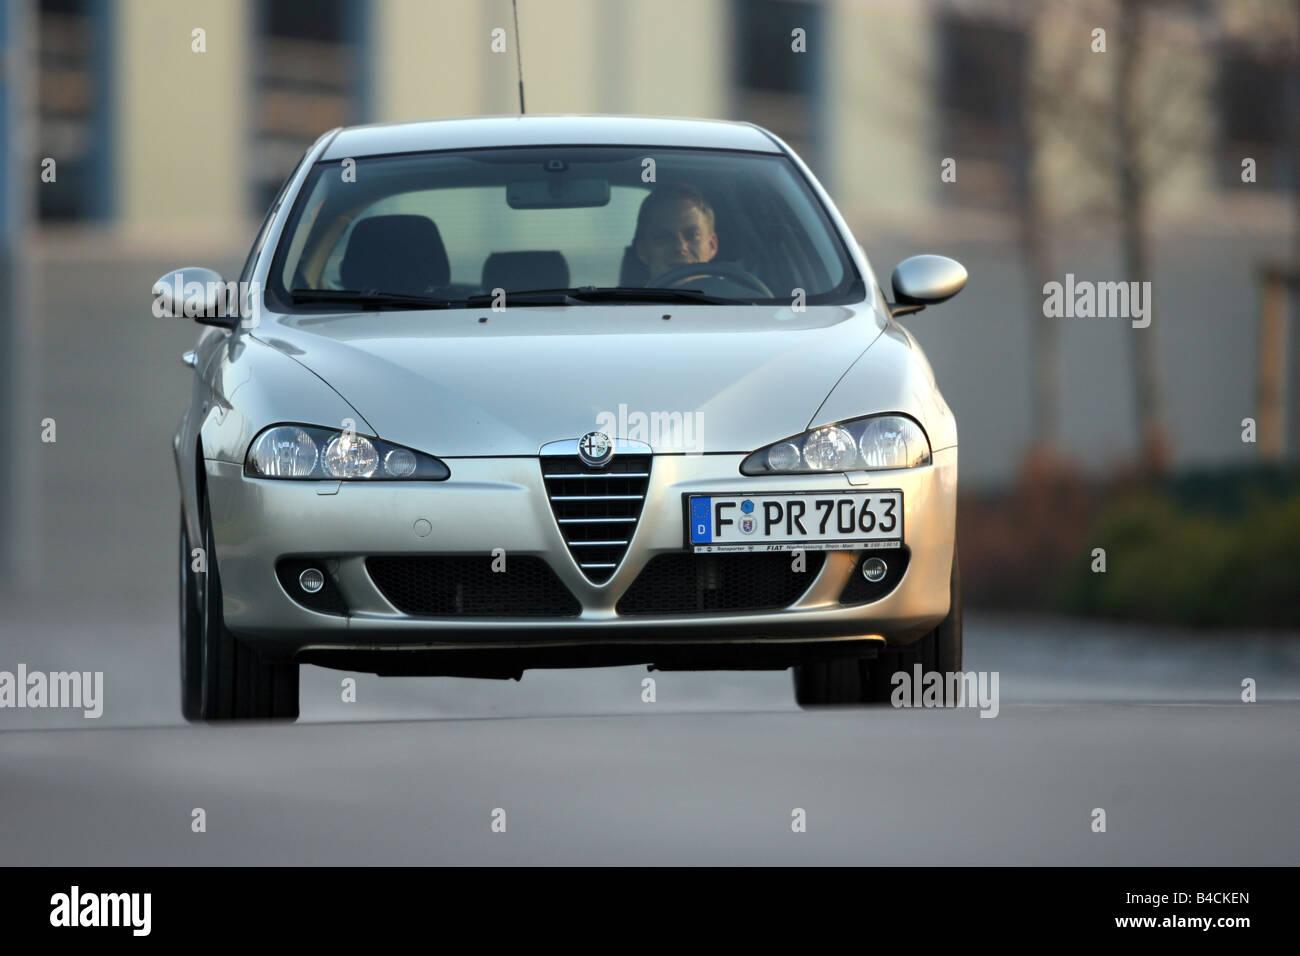 Alfa Romeo 147 1.9 JTD 16 V Distinctive, model year 2004-, silver, driving, frontal view, City - Stock Image